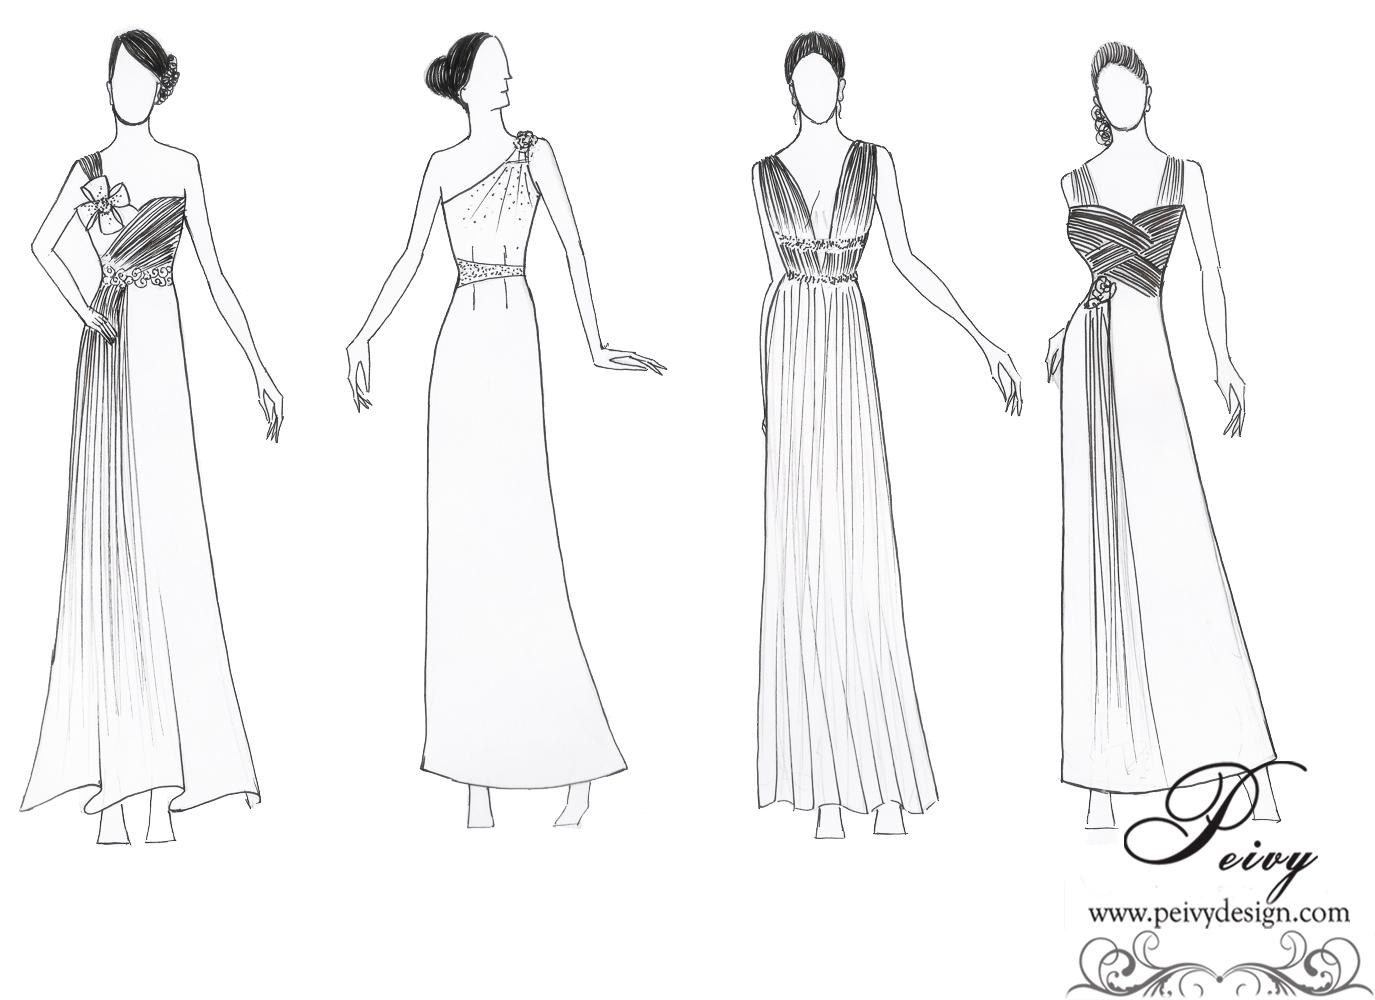 Kumpulan Soal Pelajaran 8 Sketsa Desain Baju Muslim Remaja